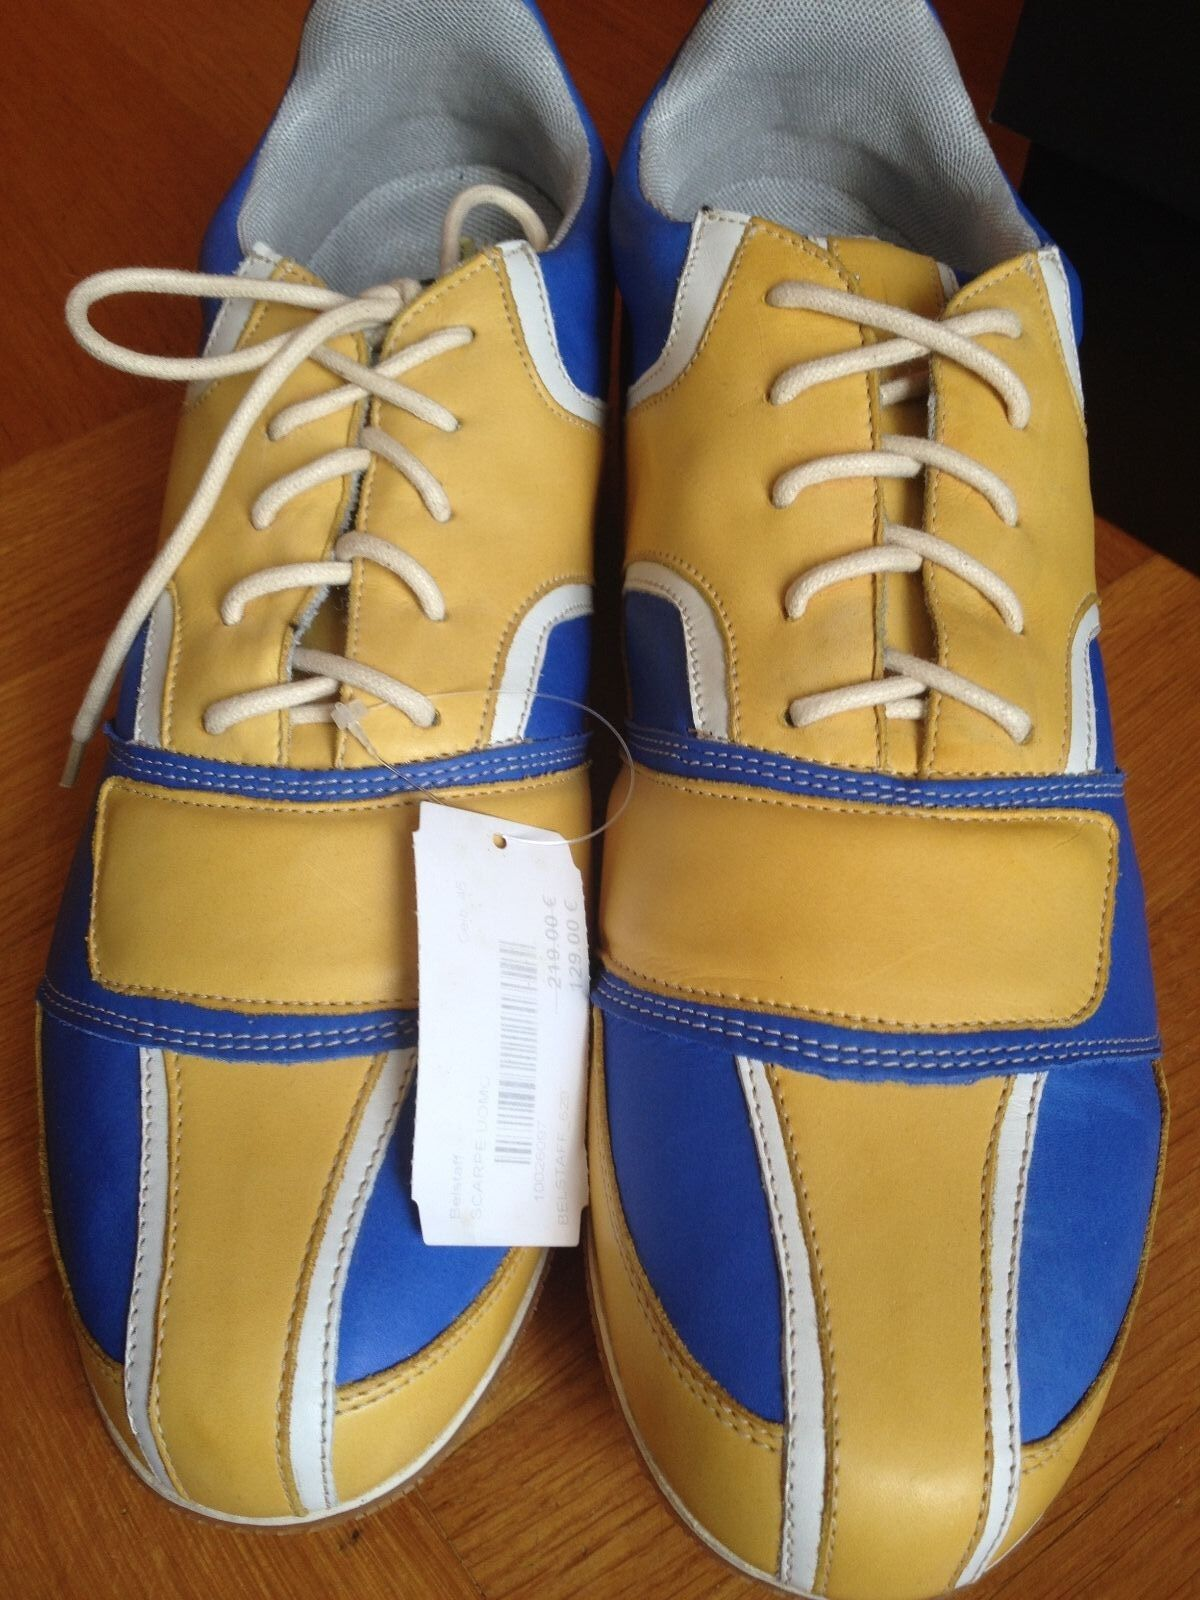 BELSTAFF SNEAKER ATHLETIC PLIMSOLLS blueE YELLOW WHITE EUR 46 US 12 UK11